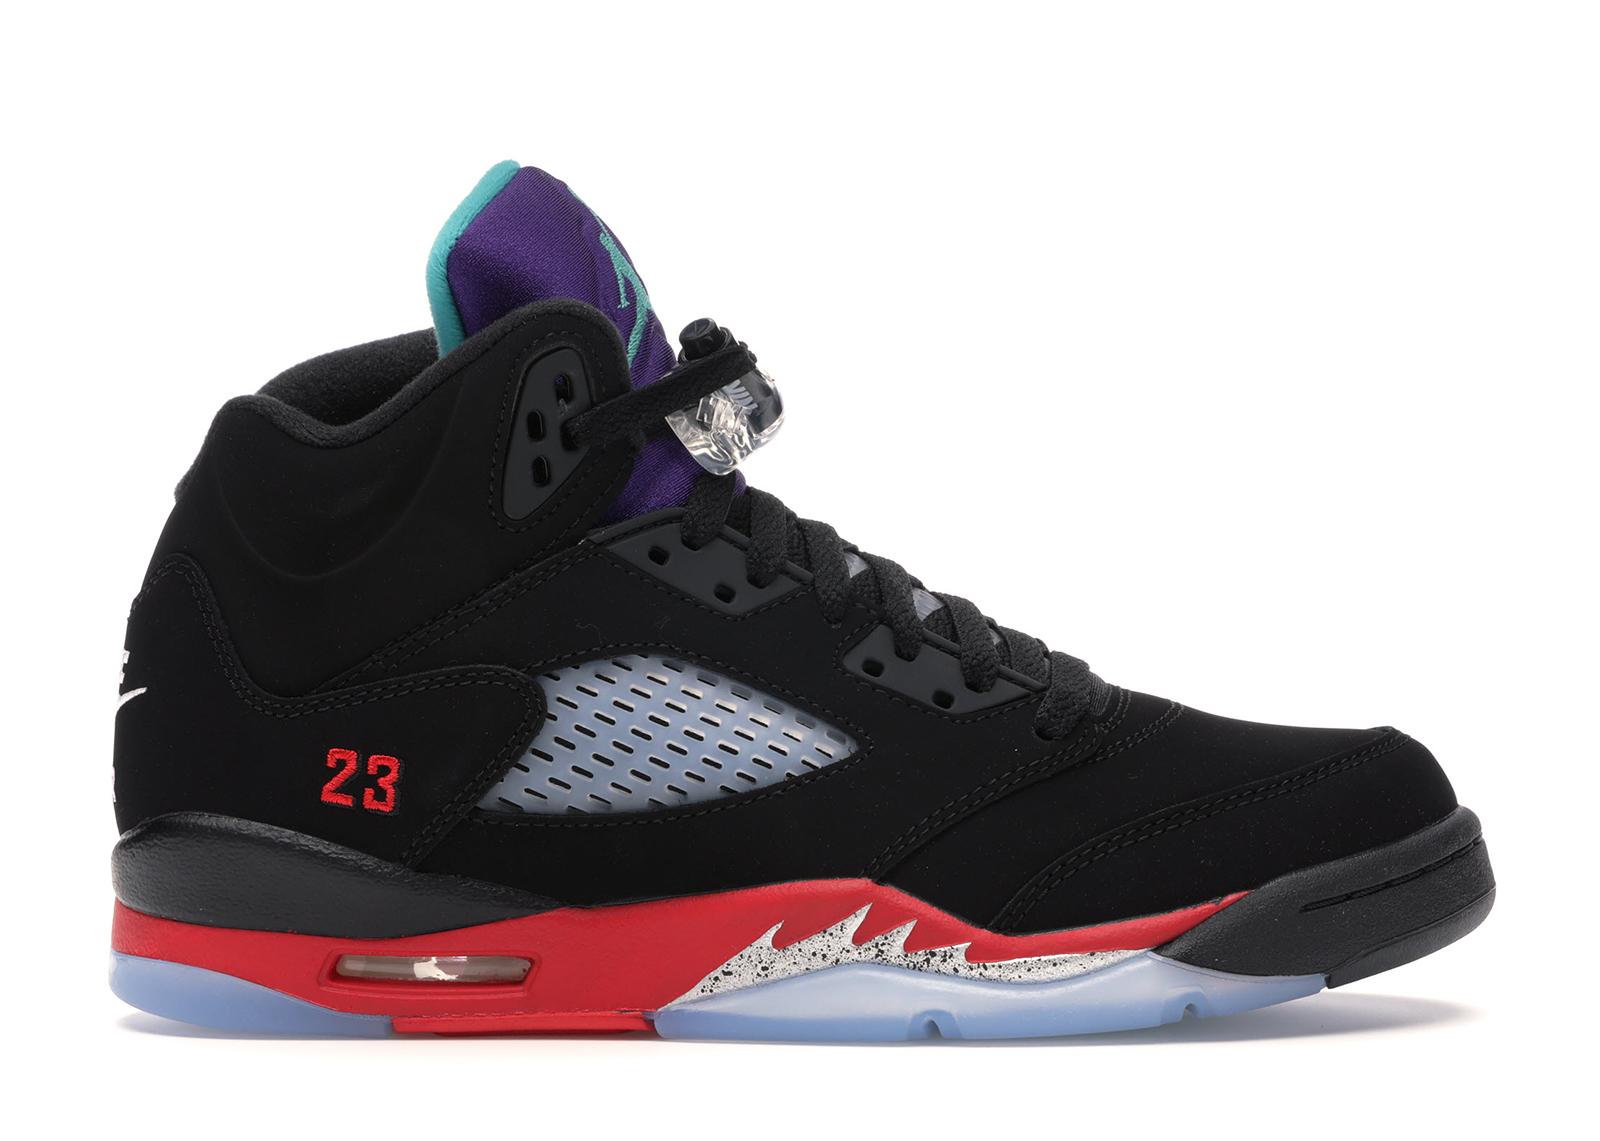 Jordan 5 Retro Top 3 (GS) - CZ2989-001